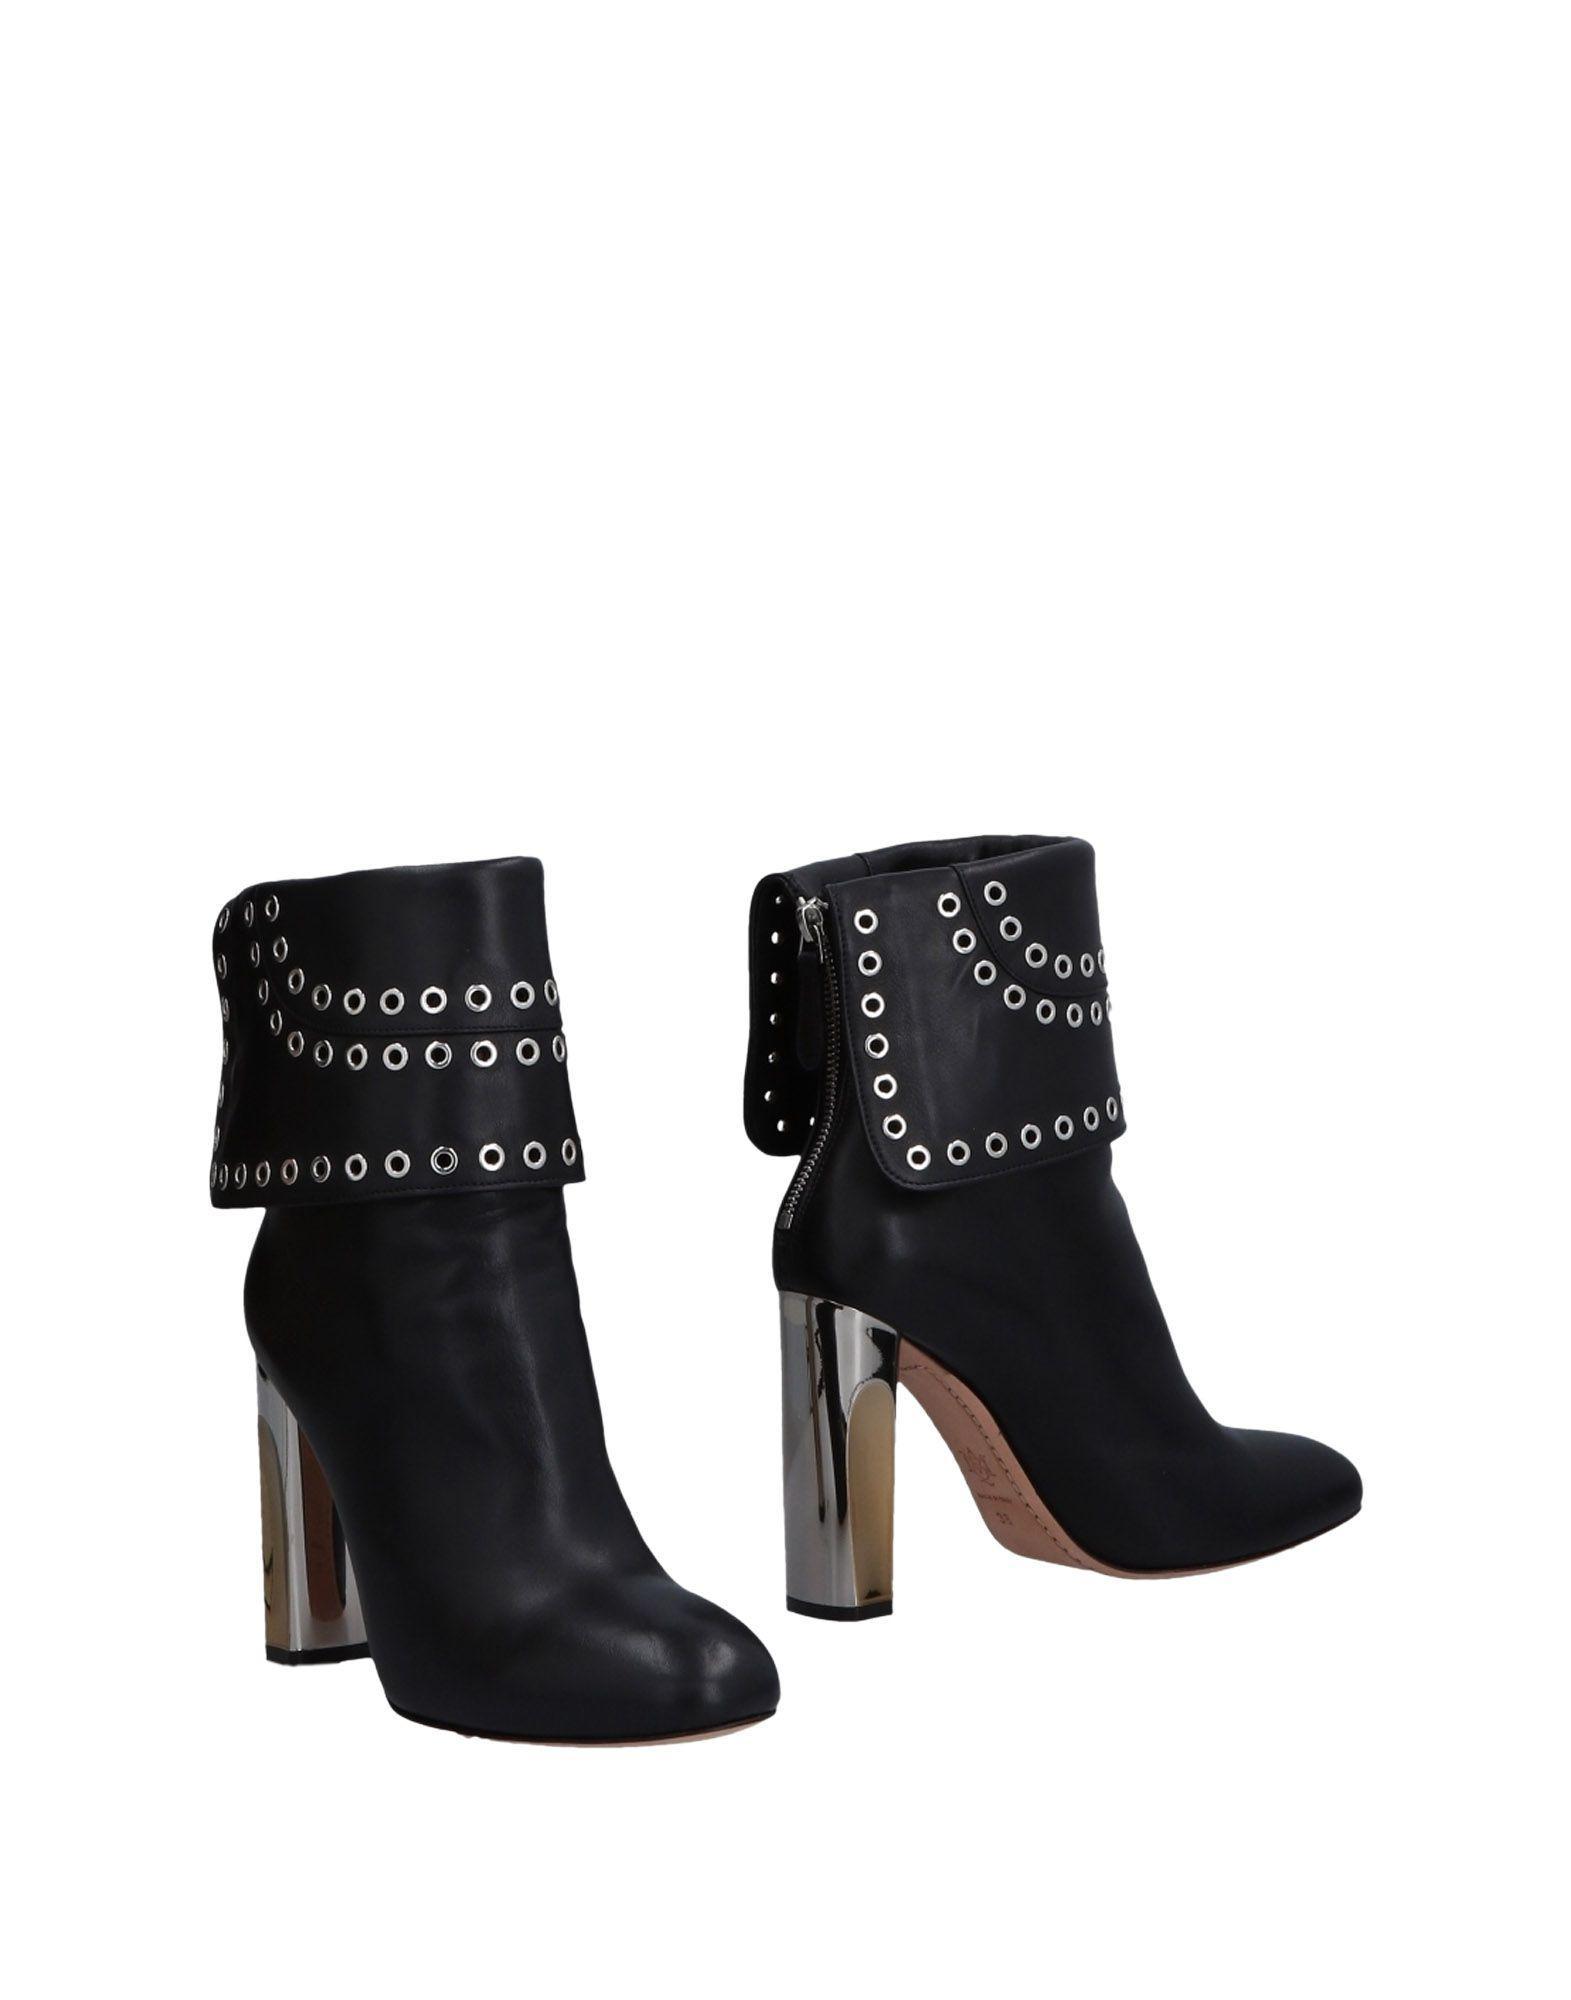 ALEXANDER MCQUEEN Ankle boot,11479063VD 15